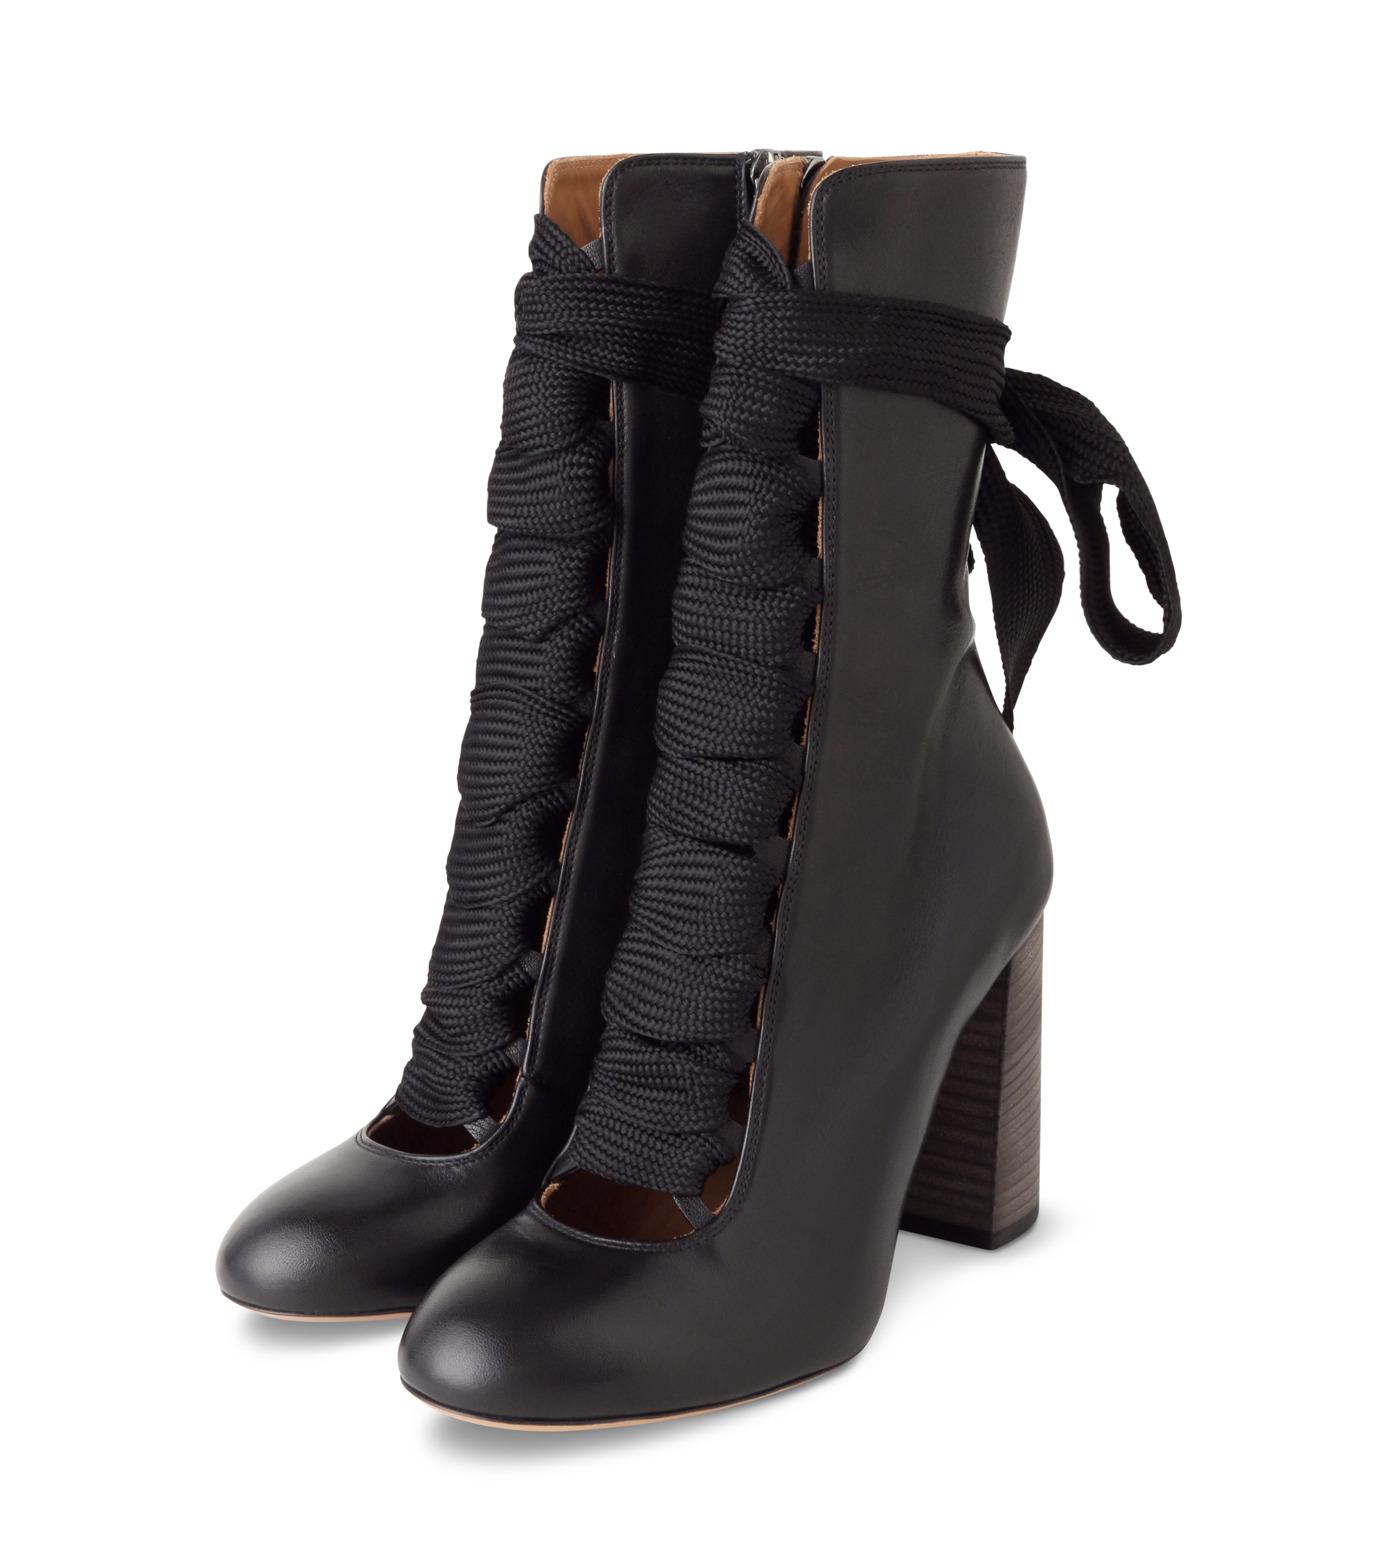 Chloe(クロエ)のharper lace up boots-BLACK(ブーツ/boots)-5534E42B-13 拡大詳細画像3